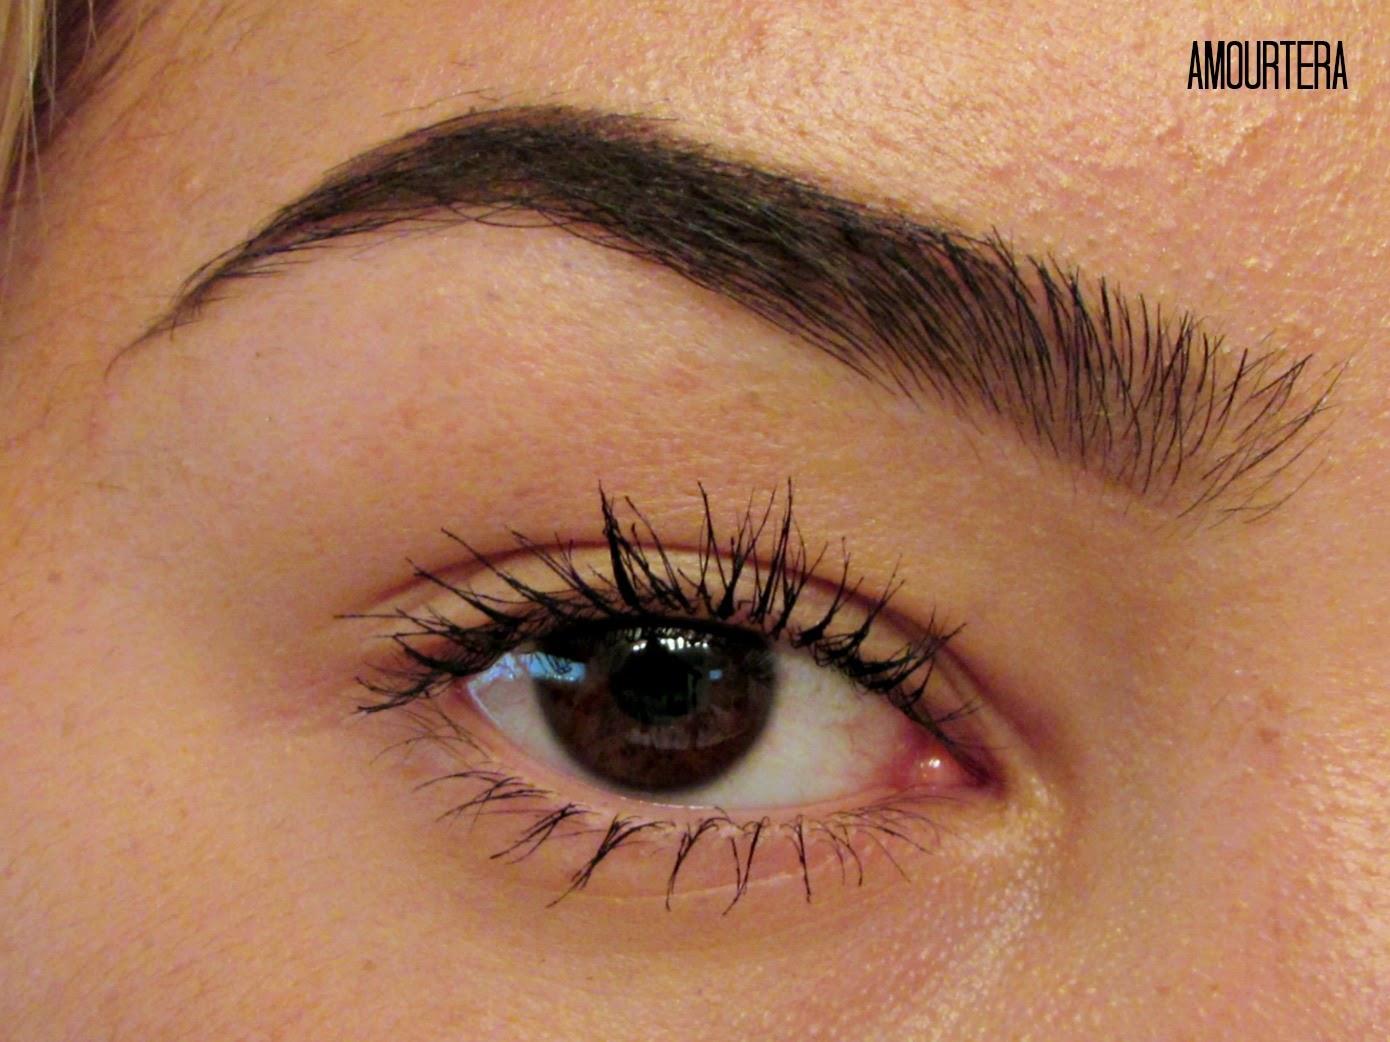 Amourtera Nyx Eyebrow Gel Review